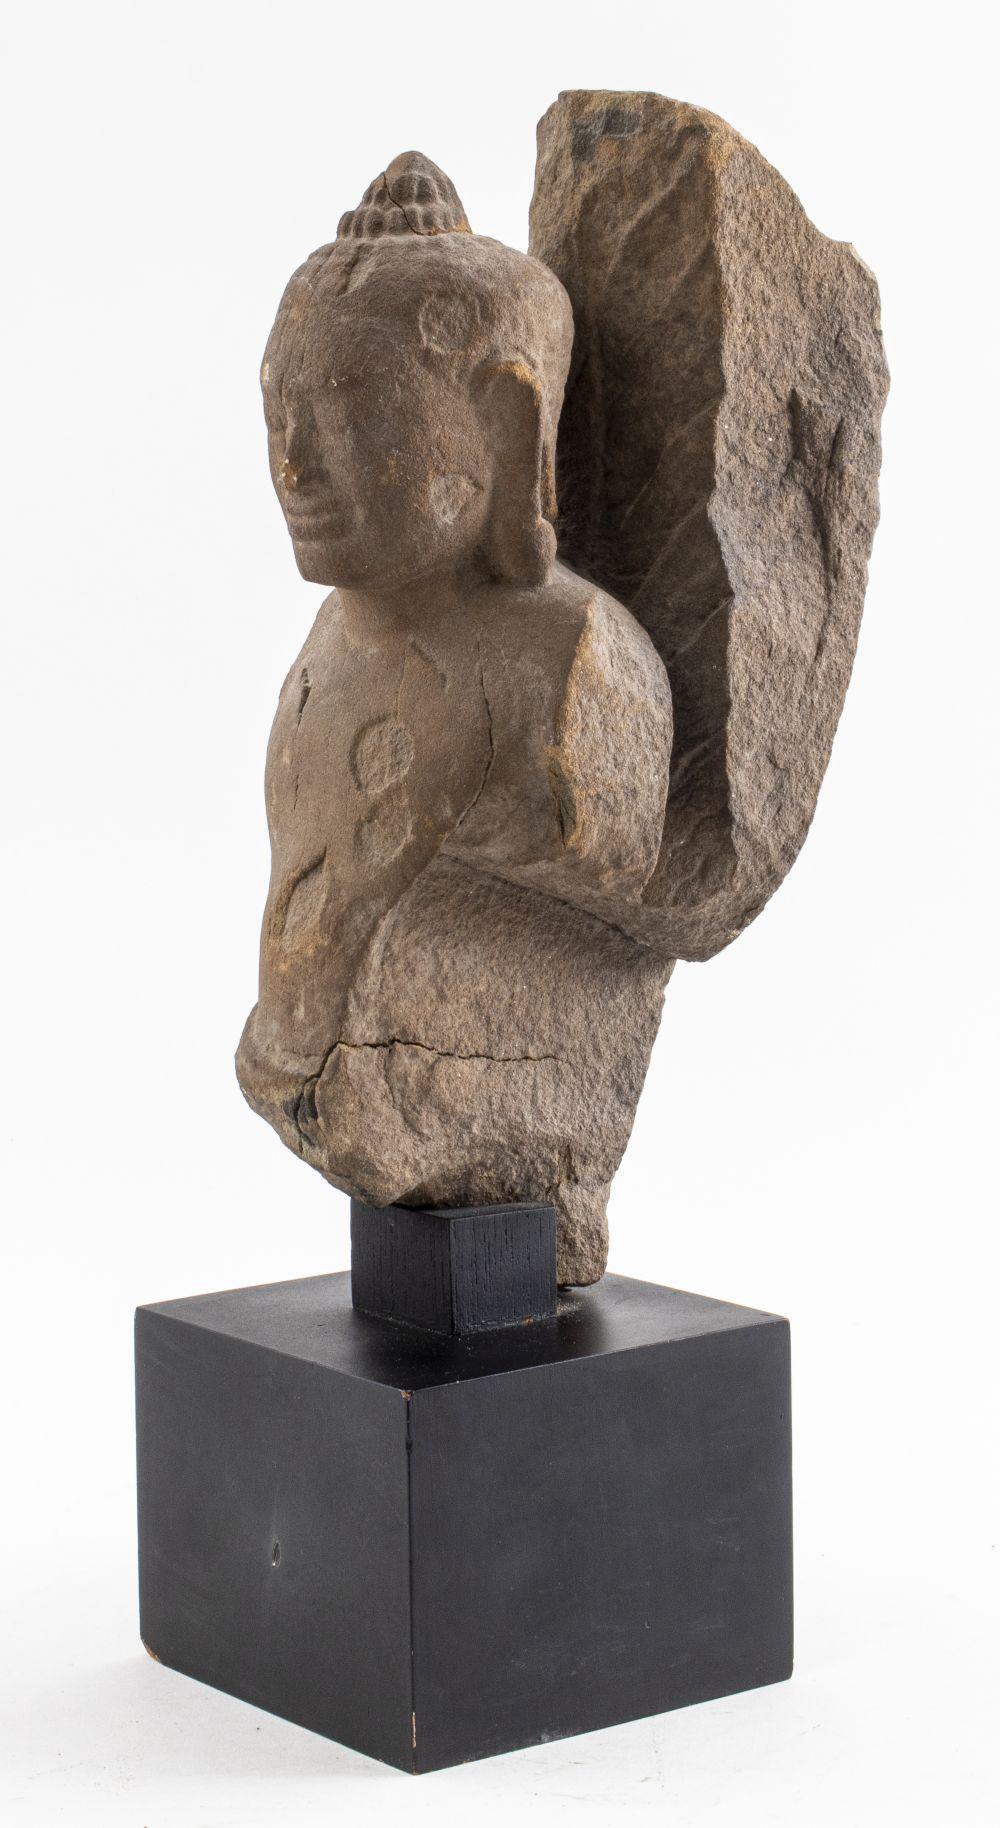 Khmer Red Sandstone Figure of the Buddha